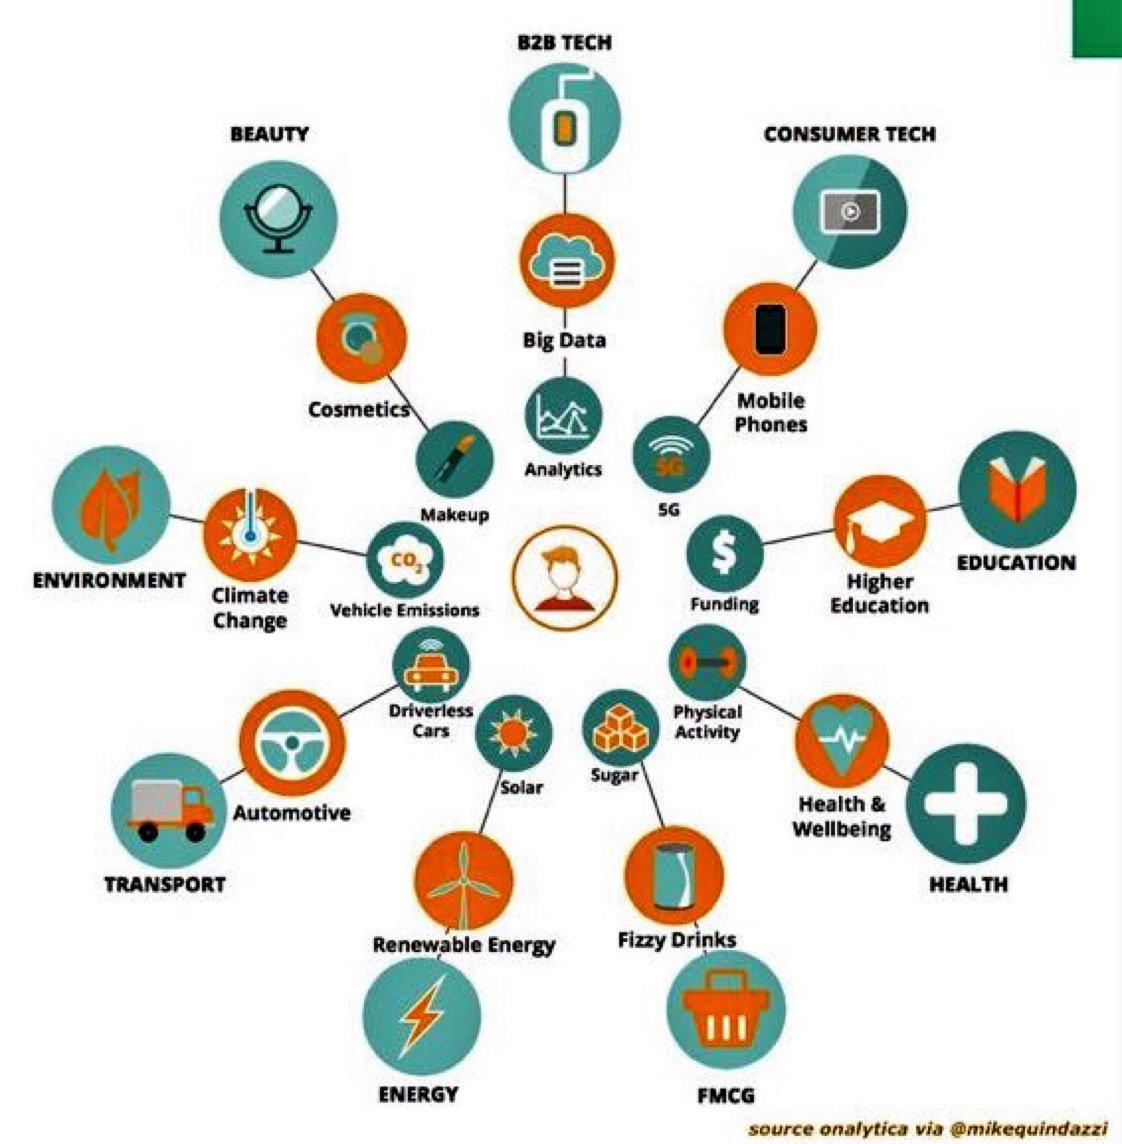 [ #DigitalMarketing ] A guide to #InfluencerMarketing &amp; Managing #Influencer Relationships   http:// bit.ly/2husJ2q  &nbsp;   @MikeQuindazzi  #Abhiseo<br>http://pic.twitter.com/iH6g2JnTAn